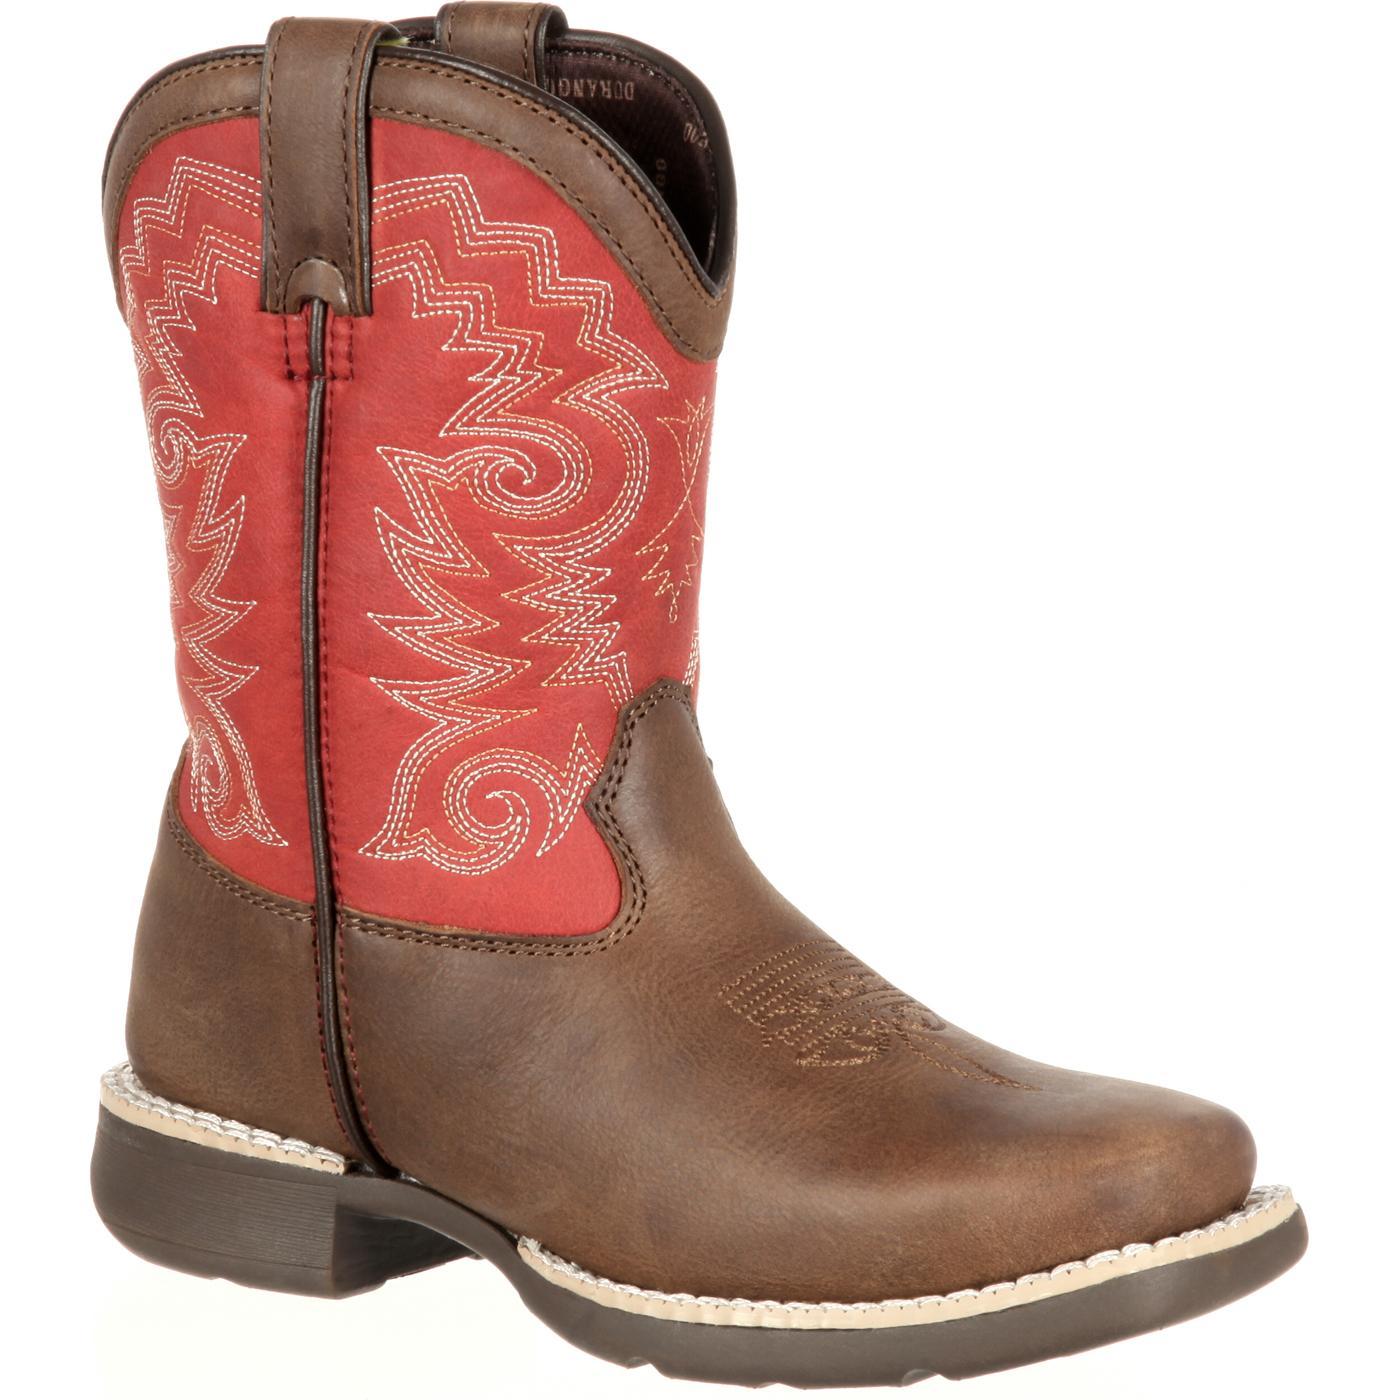 Kid&39s Durango Boots - Shop Kids cowboy boots